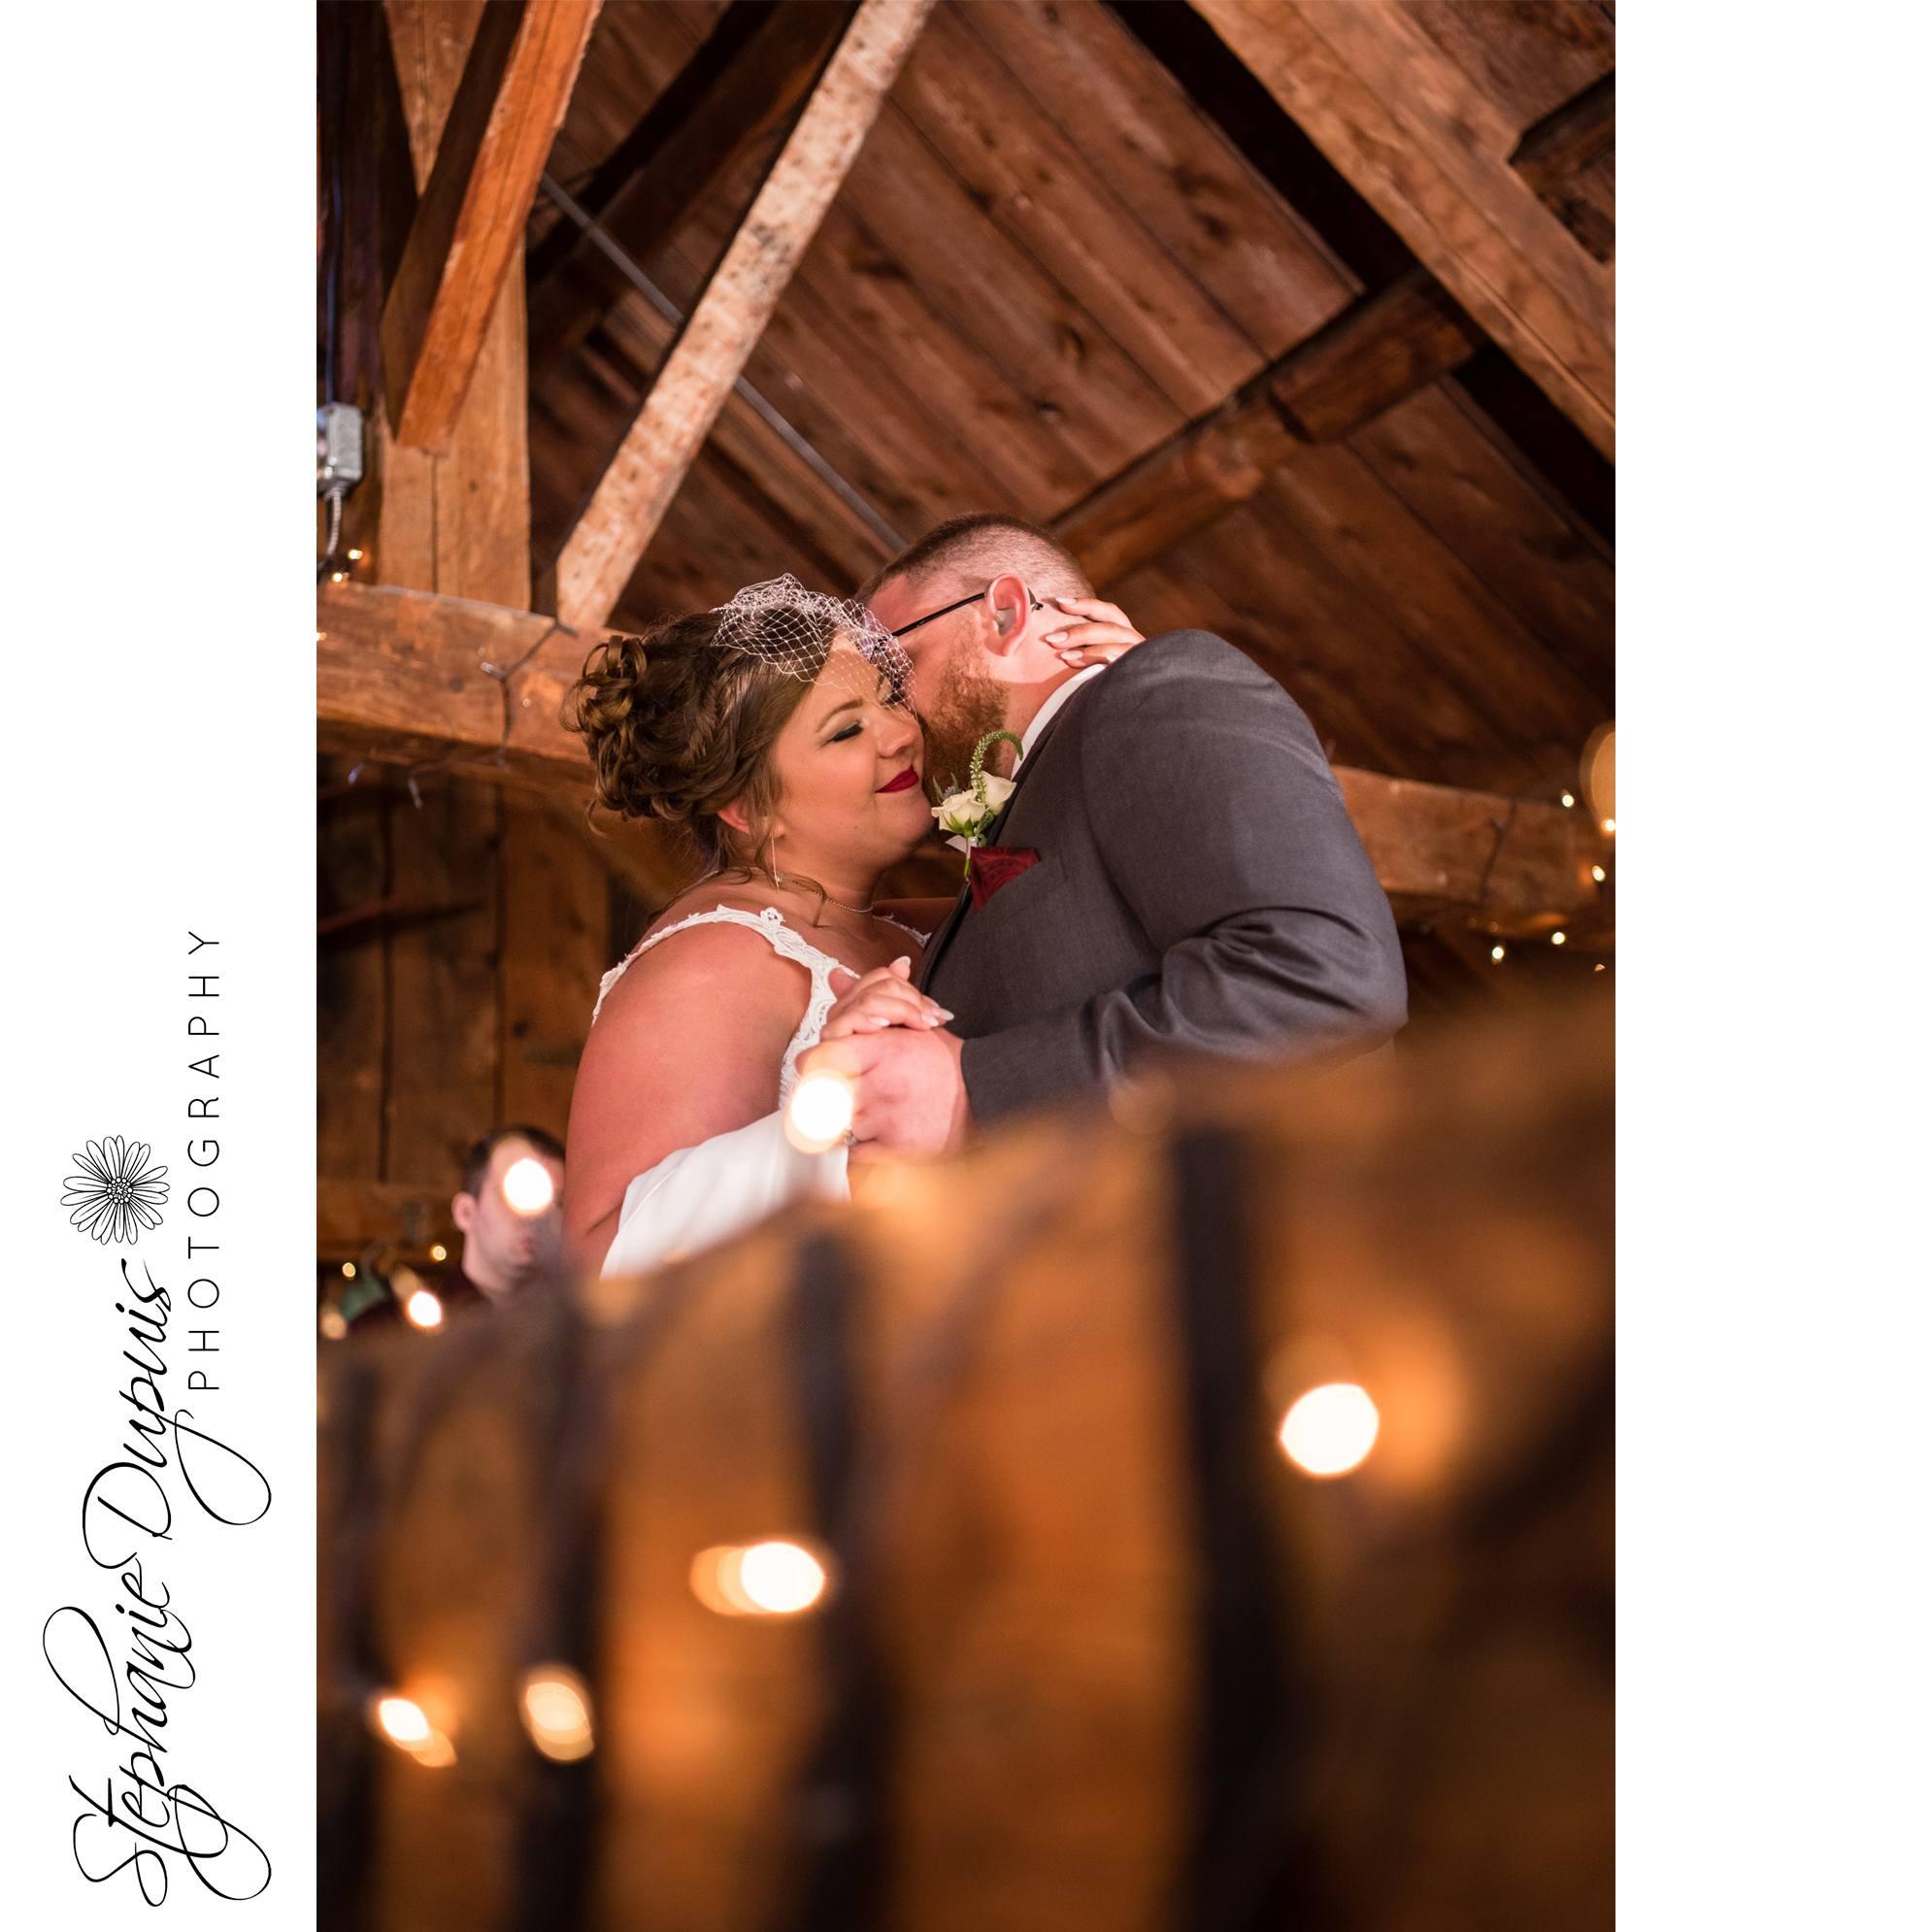 Pushee 17 - Portfolio: Pushee Wedding